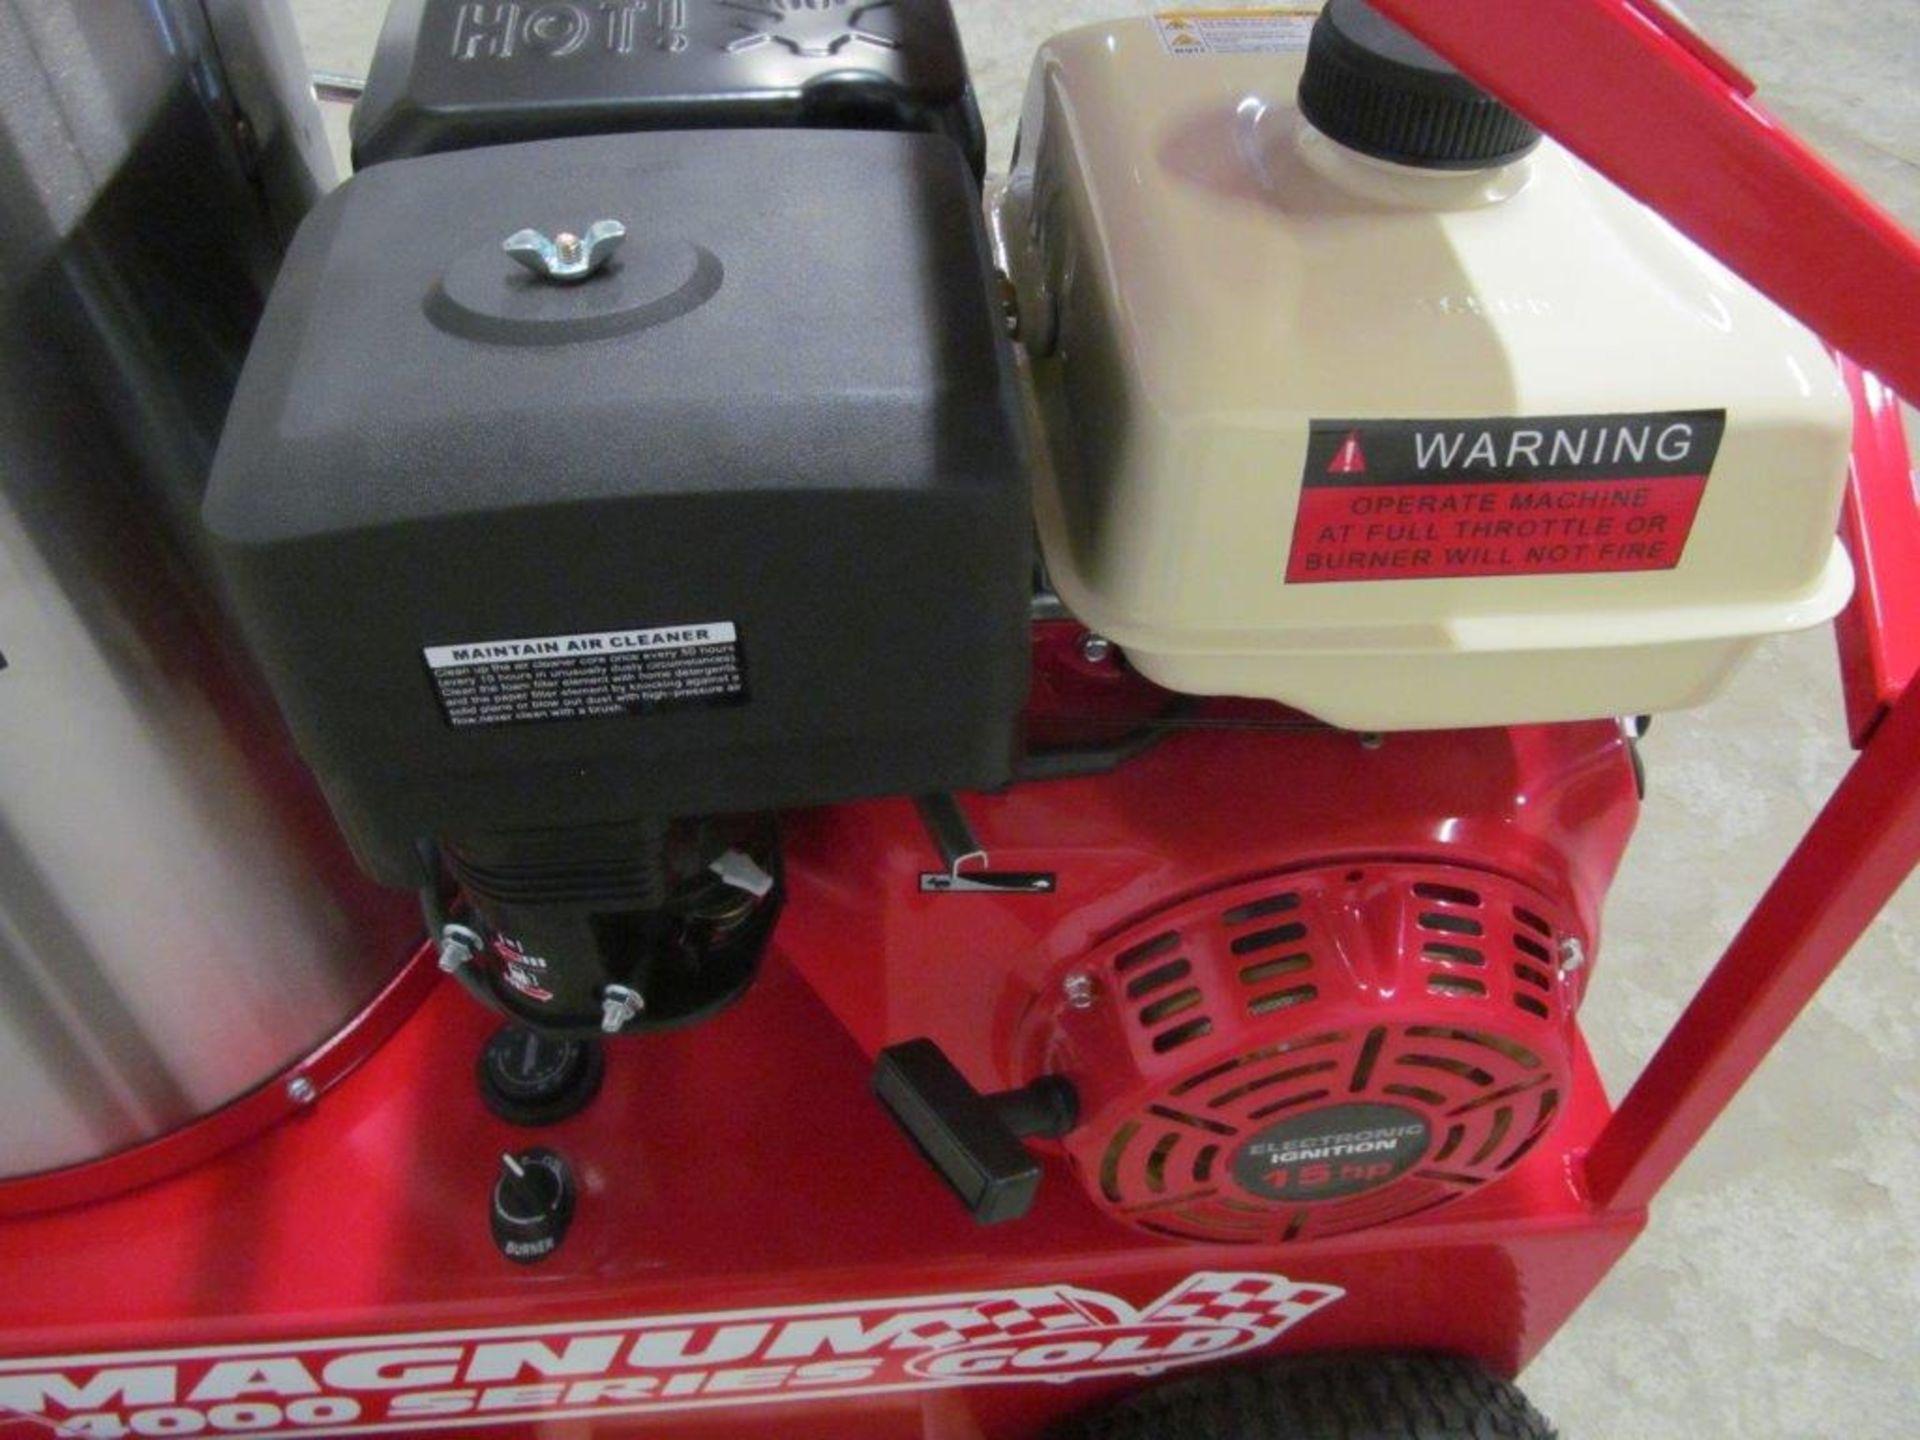 (NEW) EASY-KLEEN HOT WATER PRESSURE WASHER, MDL. MAGNUM GOLD, 15 HP ENGINE. DIESEL FIRED BURNER - Image 8 of 12